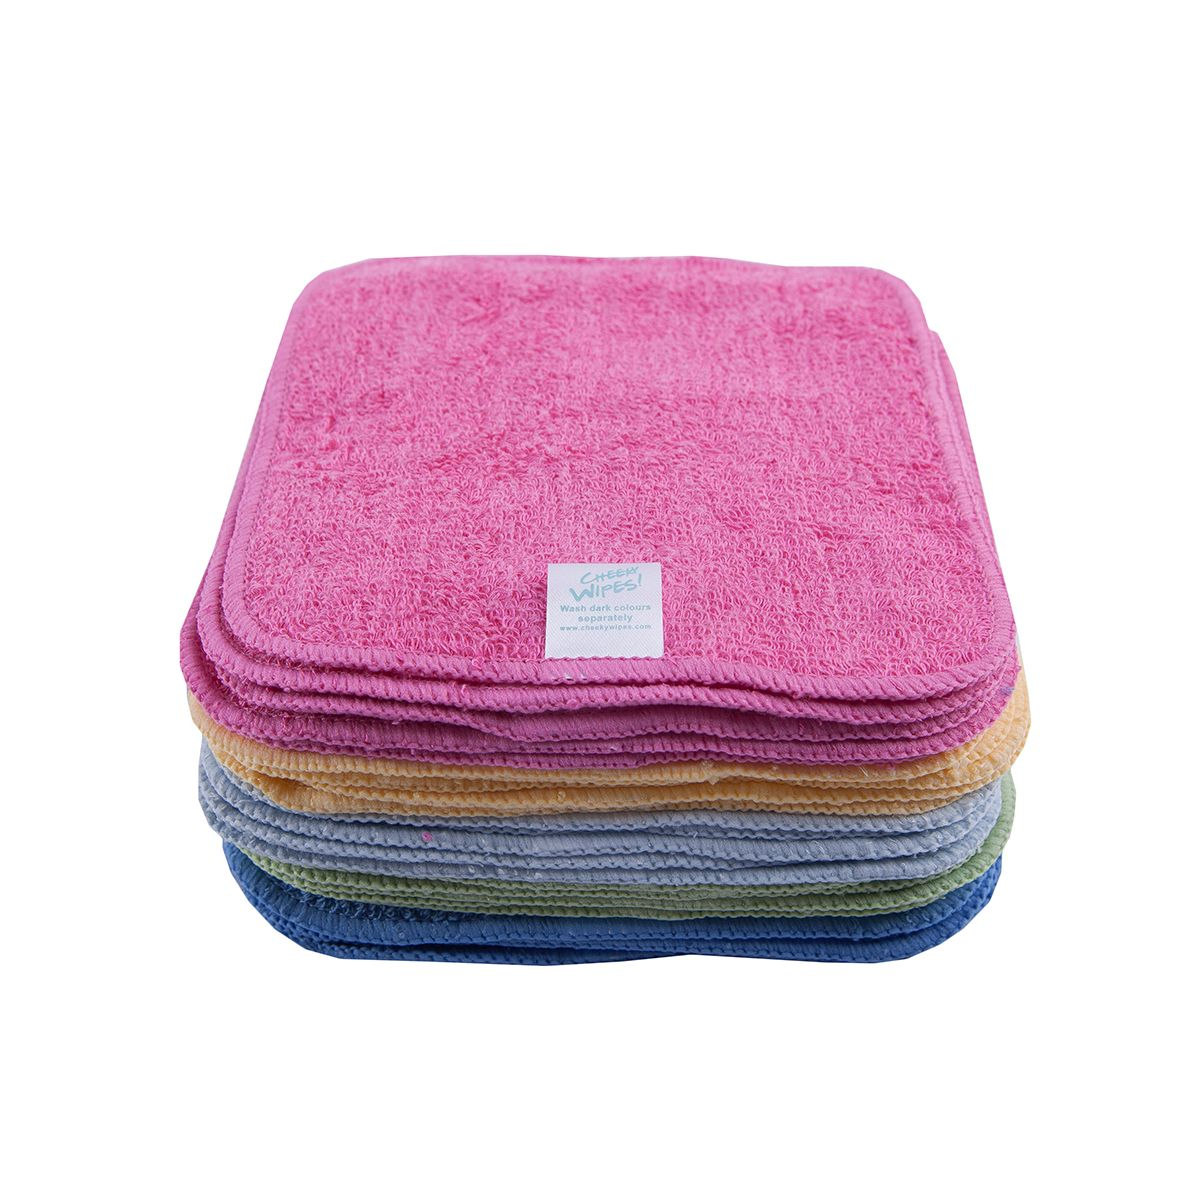 mini kit lingettes lavables bambou arc en ciel 1 he lavande camomille sebio. Black Bedroom Furniture Sets. Home Design Ideas